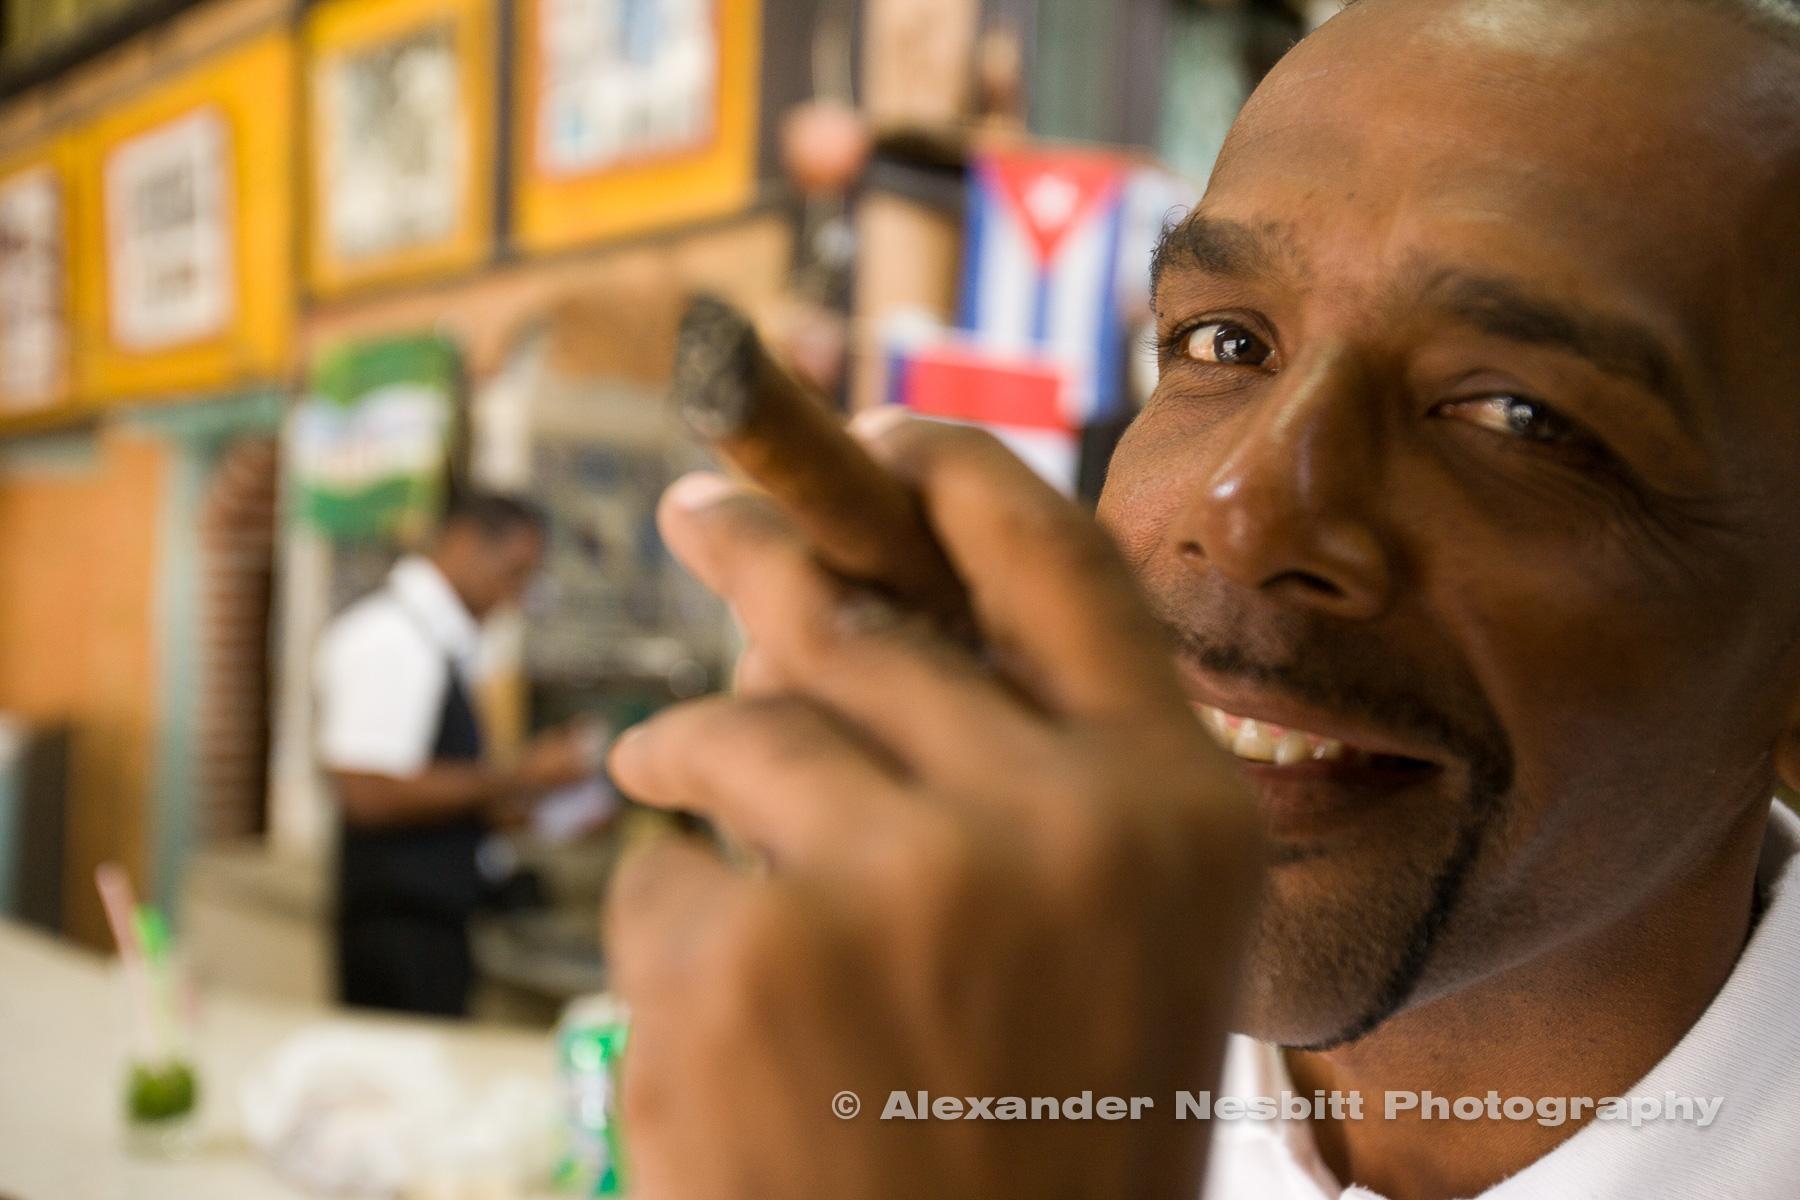 Havana, Cuba - Cuban Man with his cigar in a close up, low depth of field portrait in a bar in old Havana